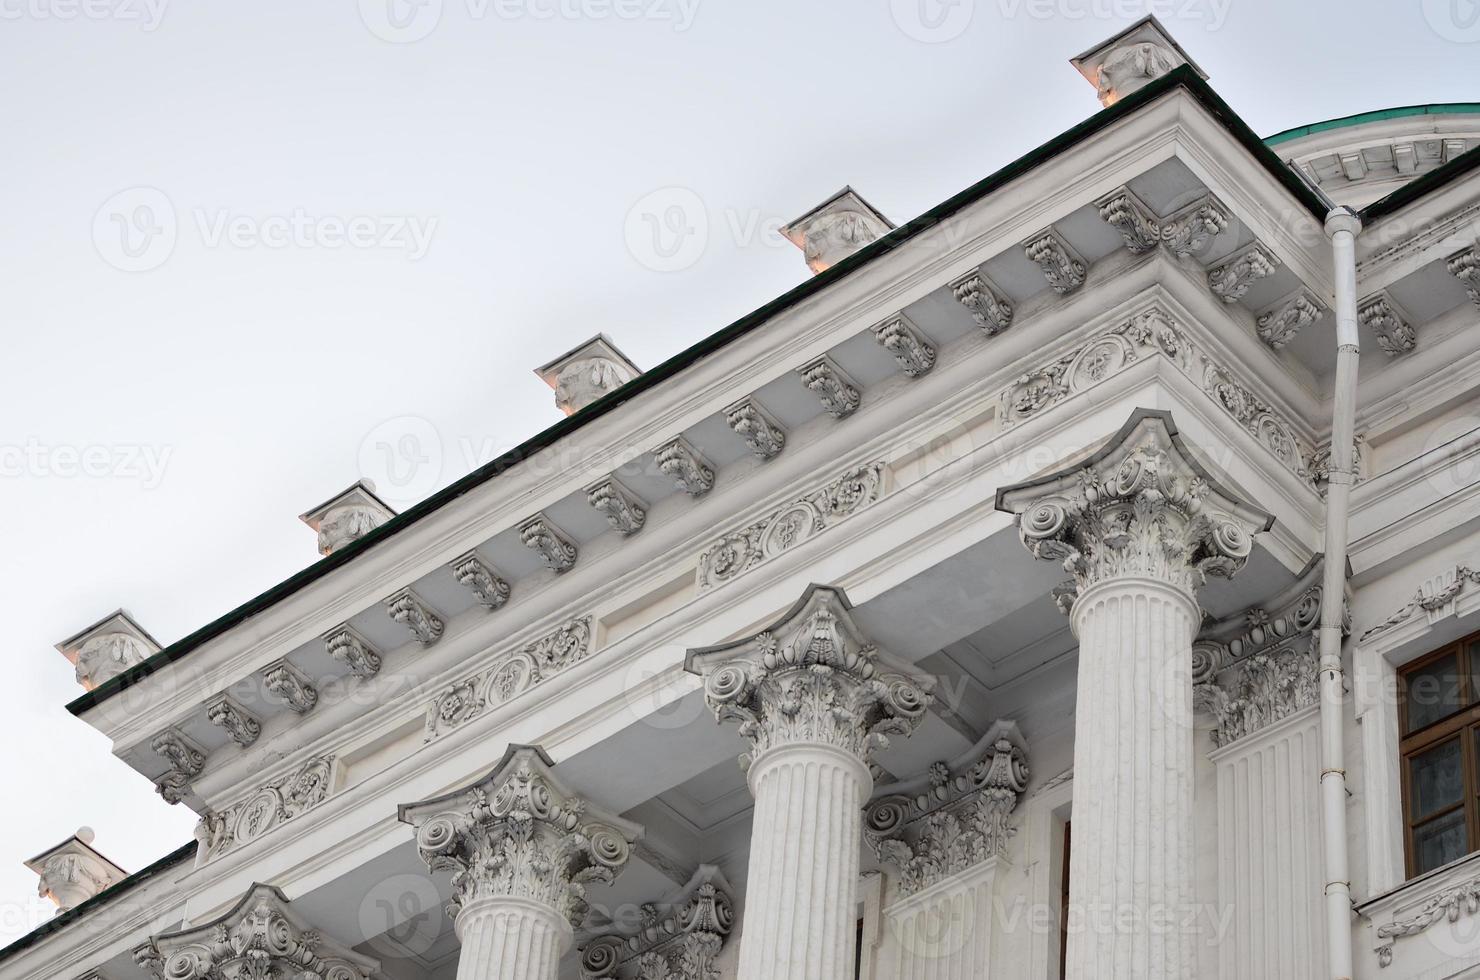 cornija do edifício central abriga pashkov, moscou foto